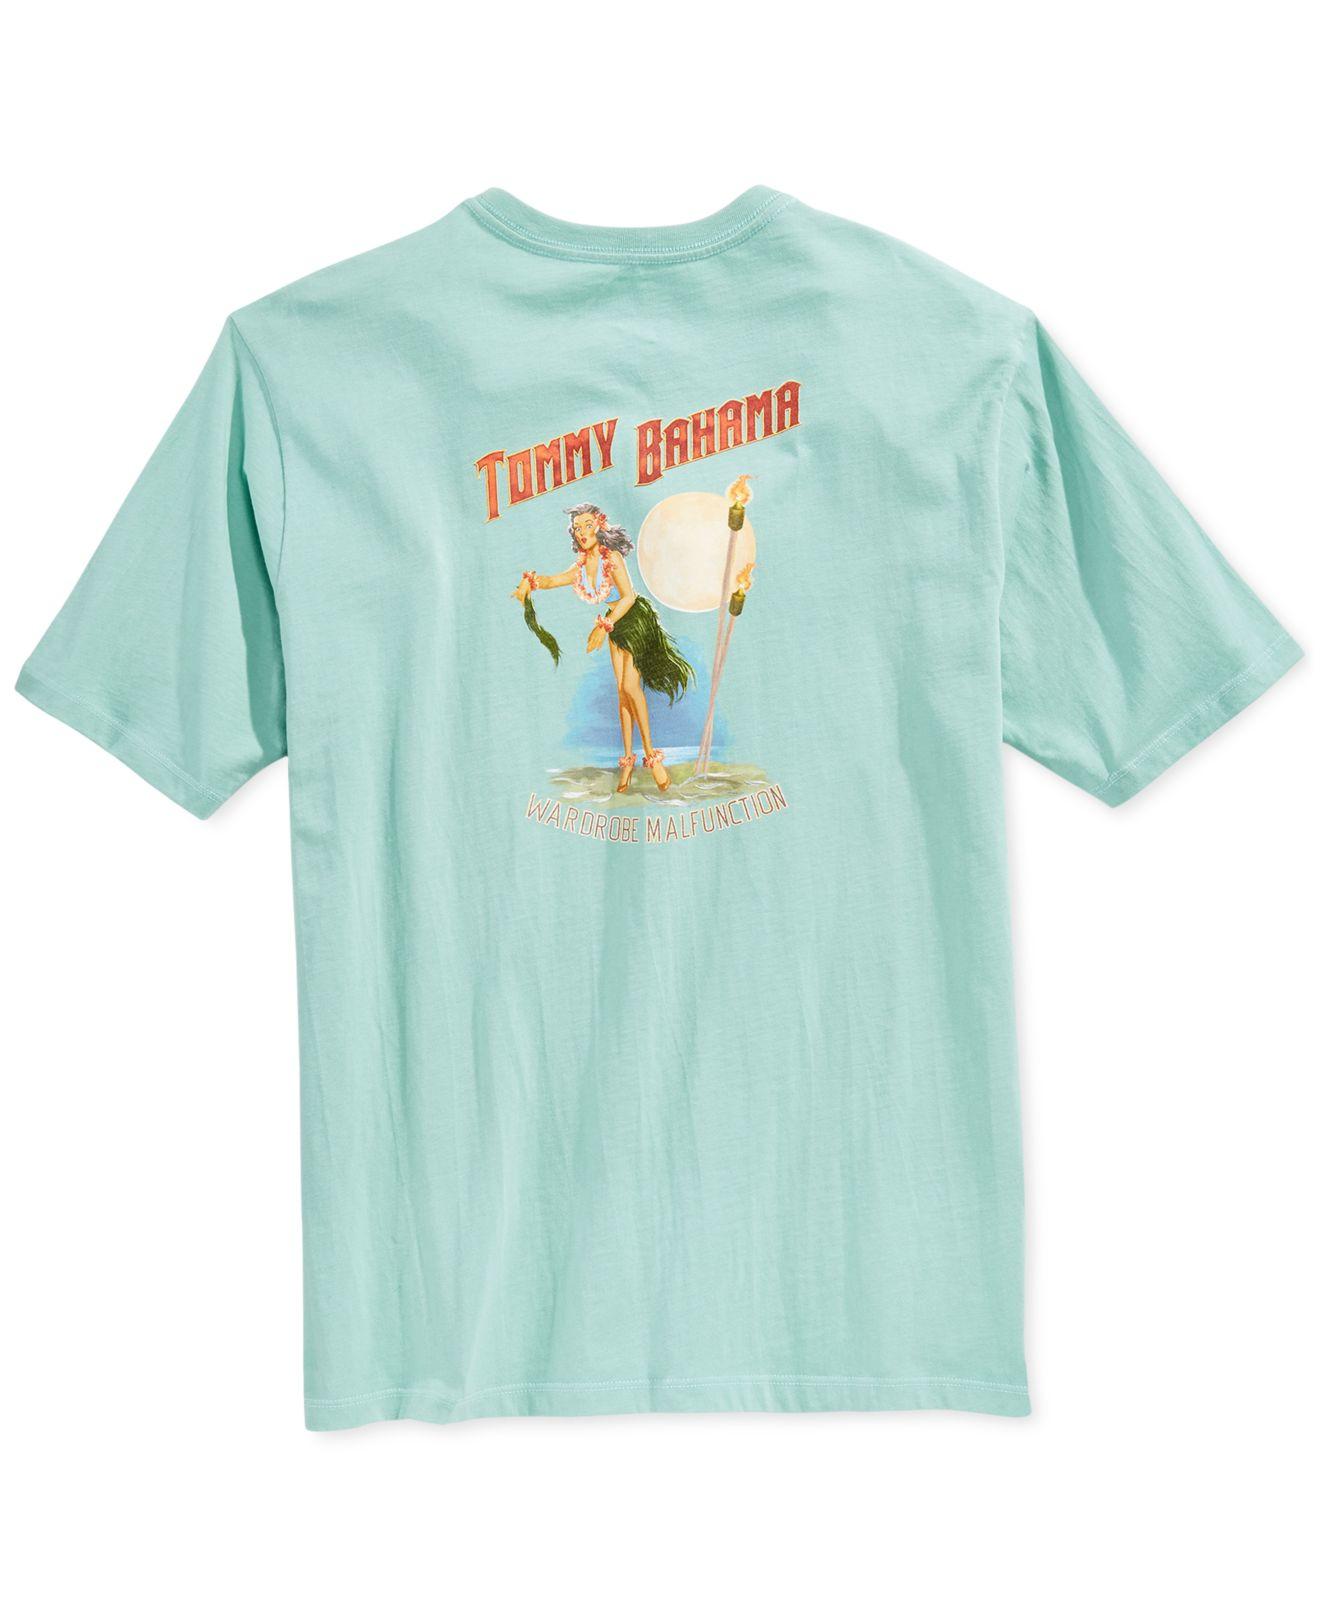 Tommy bahama wardrobe malfunction t shirt in blue for men for Custom tommy bahama shirts